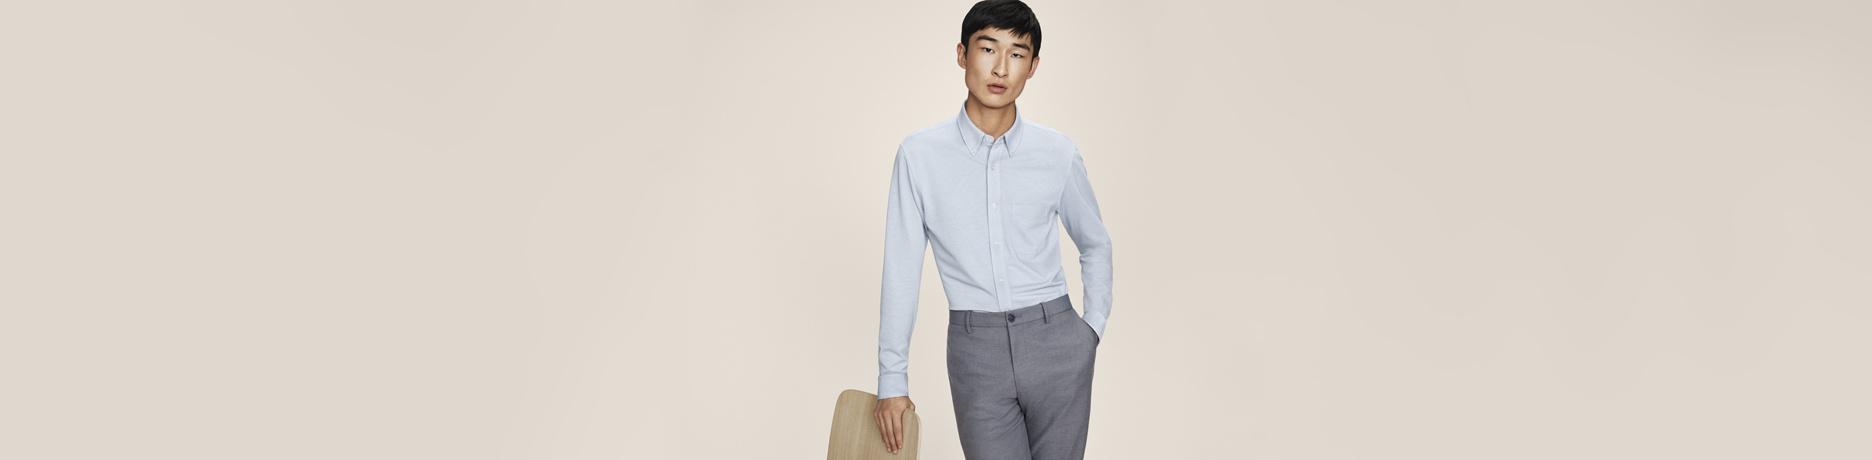 Leg day t shirts men s polo shirt slim - Smart Dress Shirts